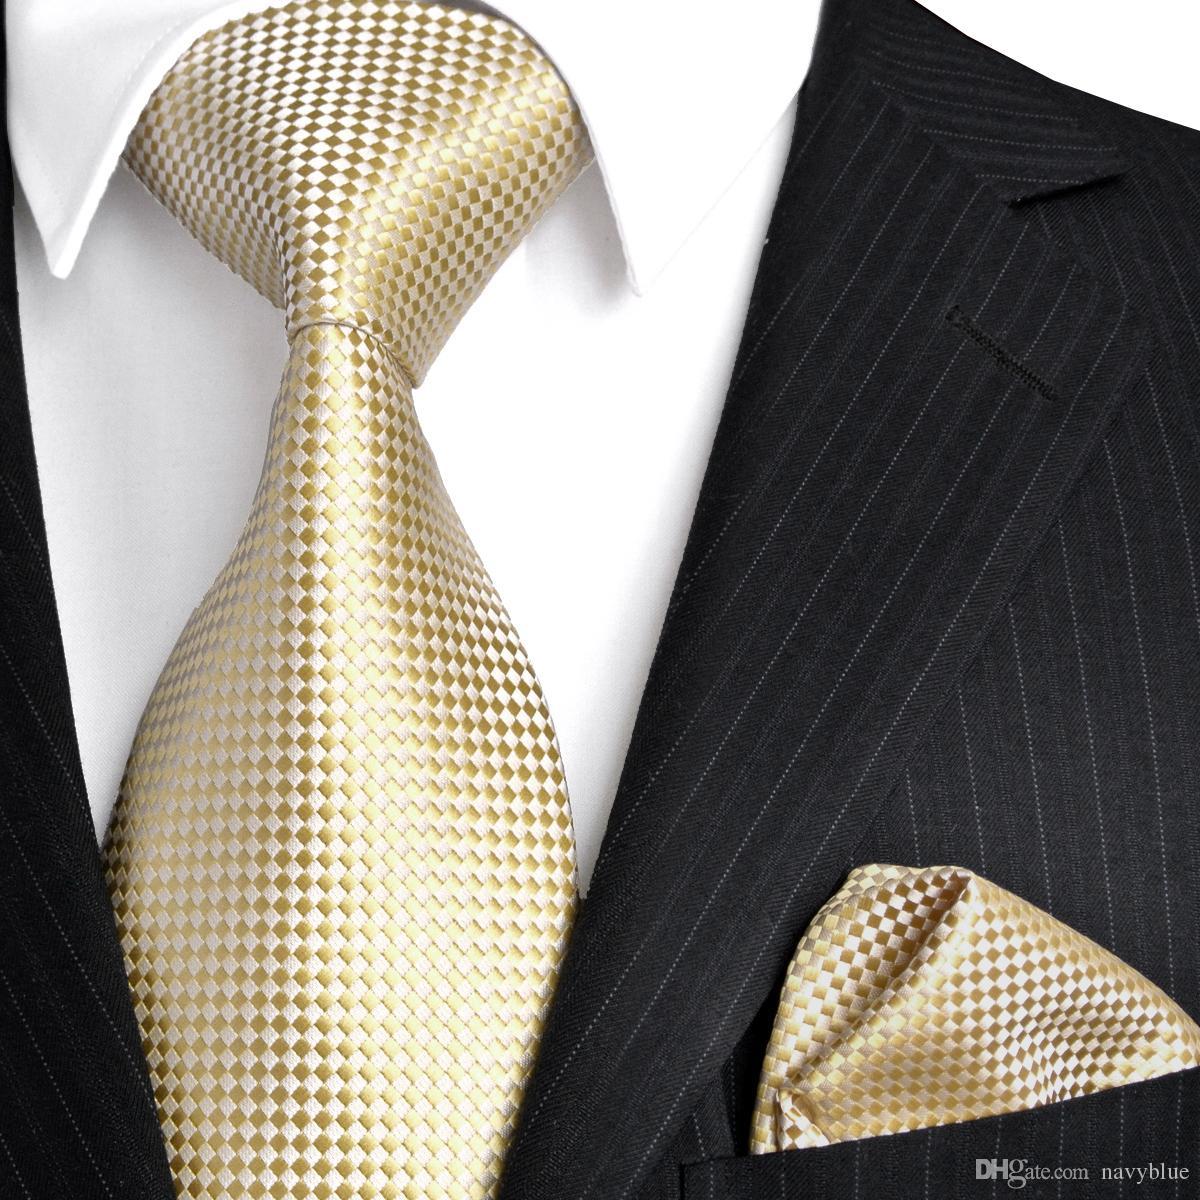 F15 골드 옐로우 실버 솔리드 남성 넥타이 넥타이 100 % 실크 자카드 직물 넥타이 세트 손수건 한 벌 선물 남성용 무료 배송 검사